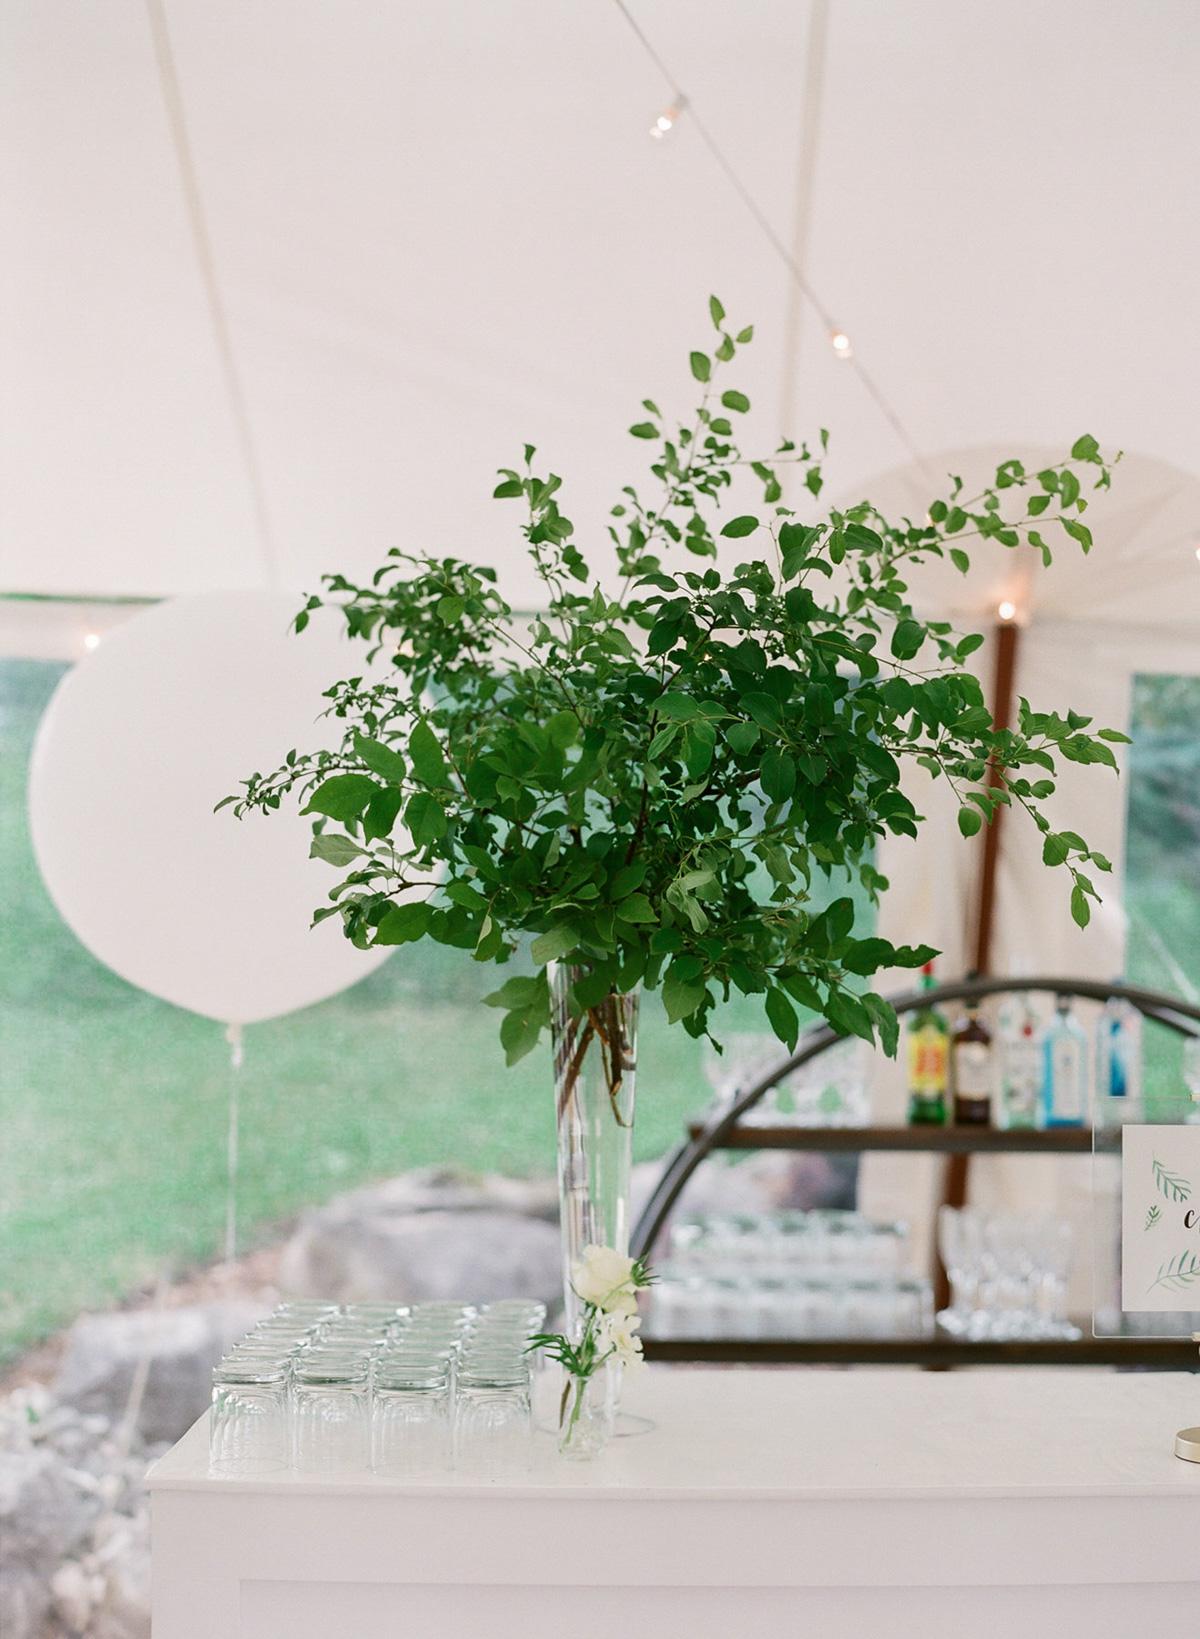 artiese-studios-vineyard-bride-swish-list-private-estate-cambridge-wedding-46.jpg